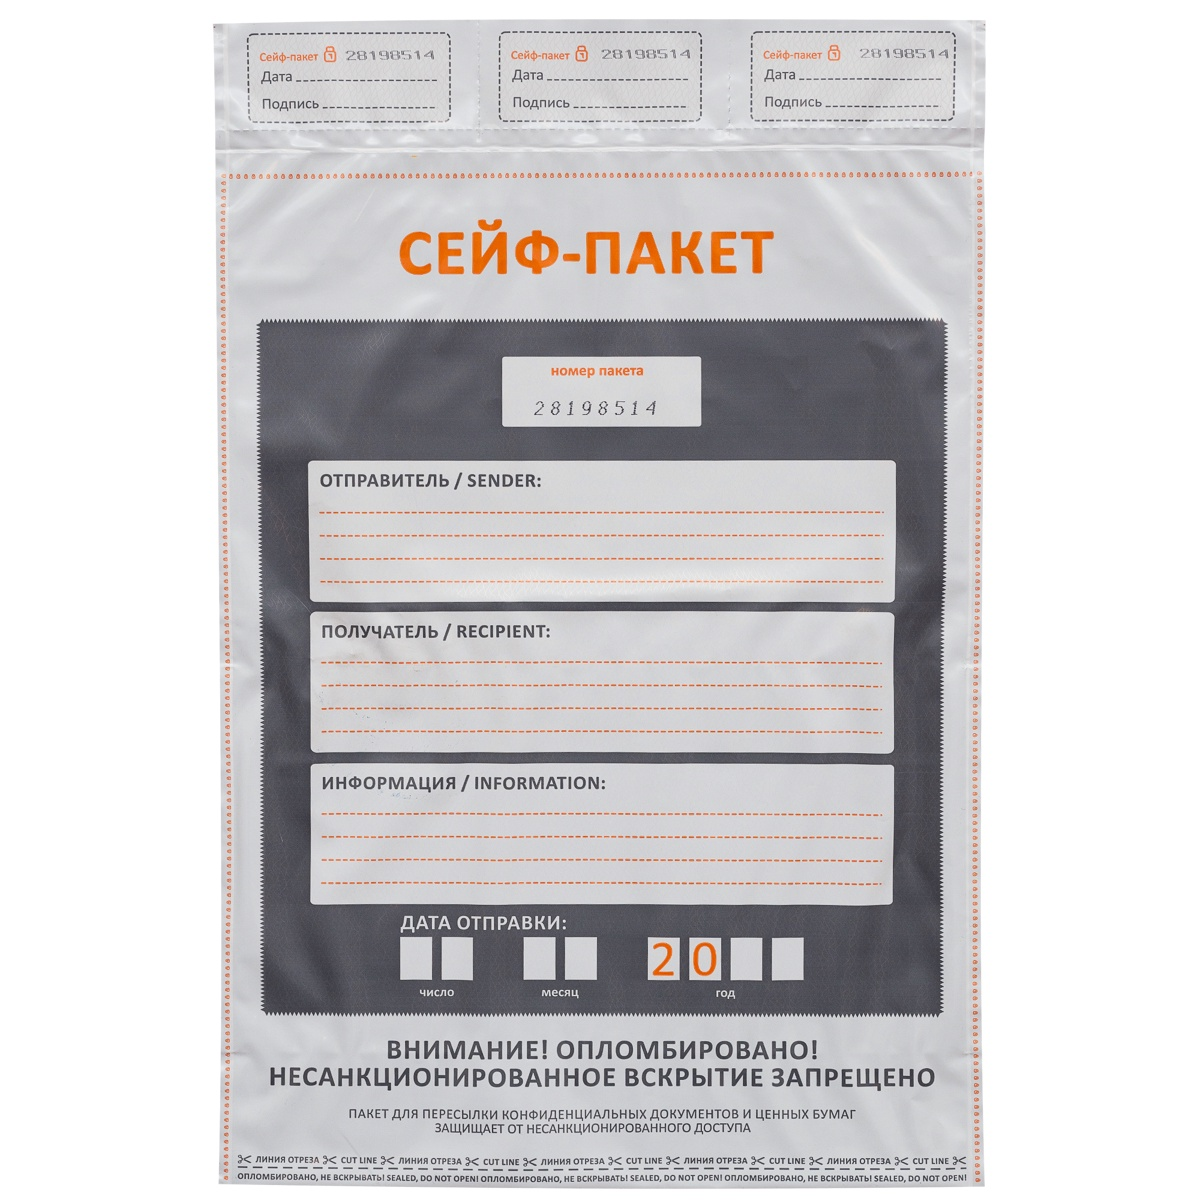 Сейф-пакет 328x510 мм 50 шт